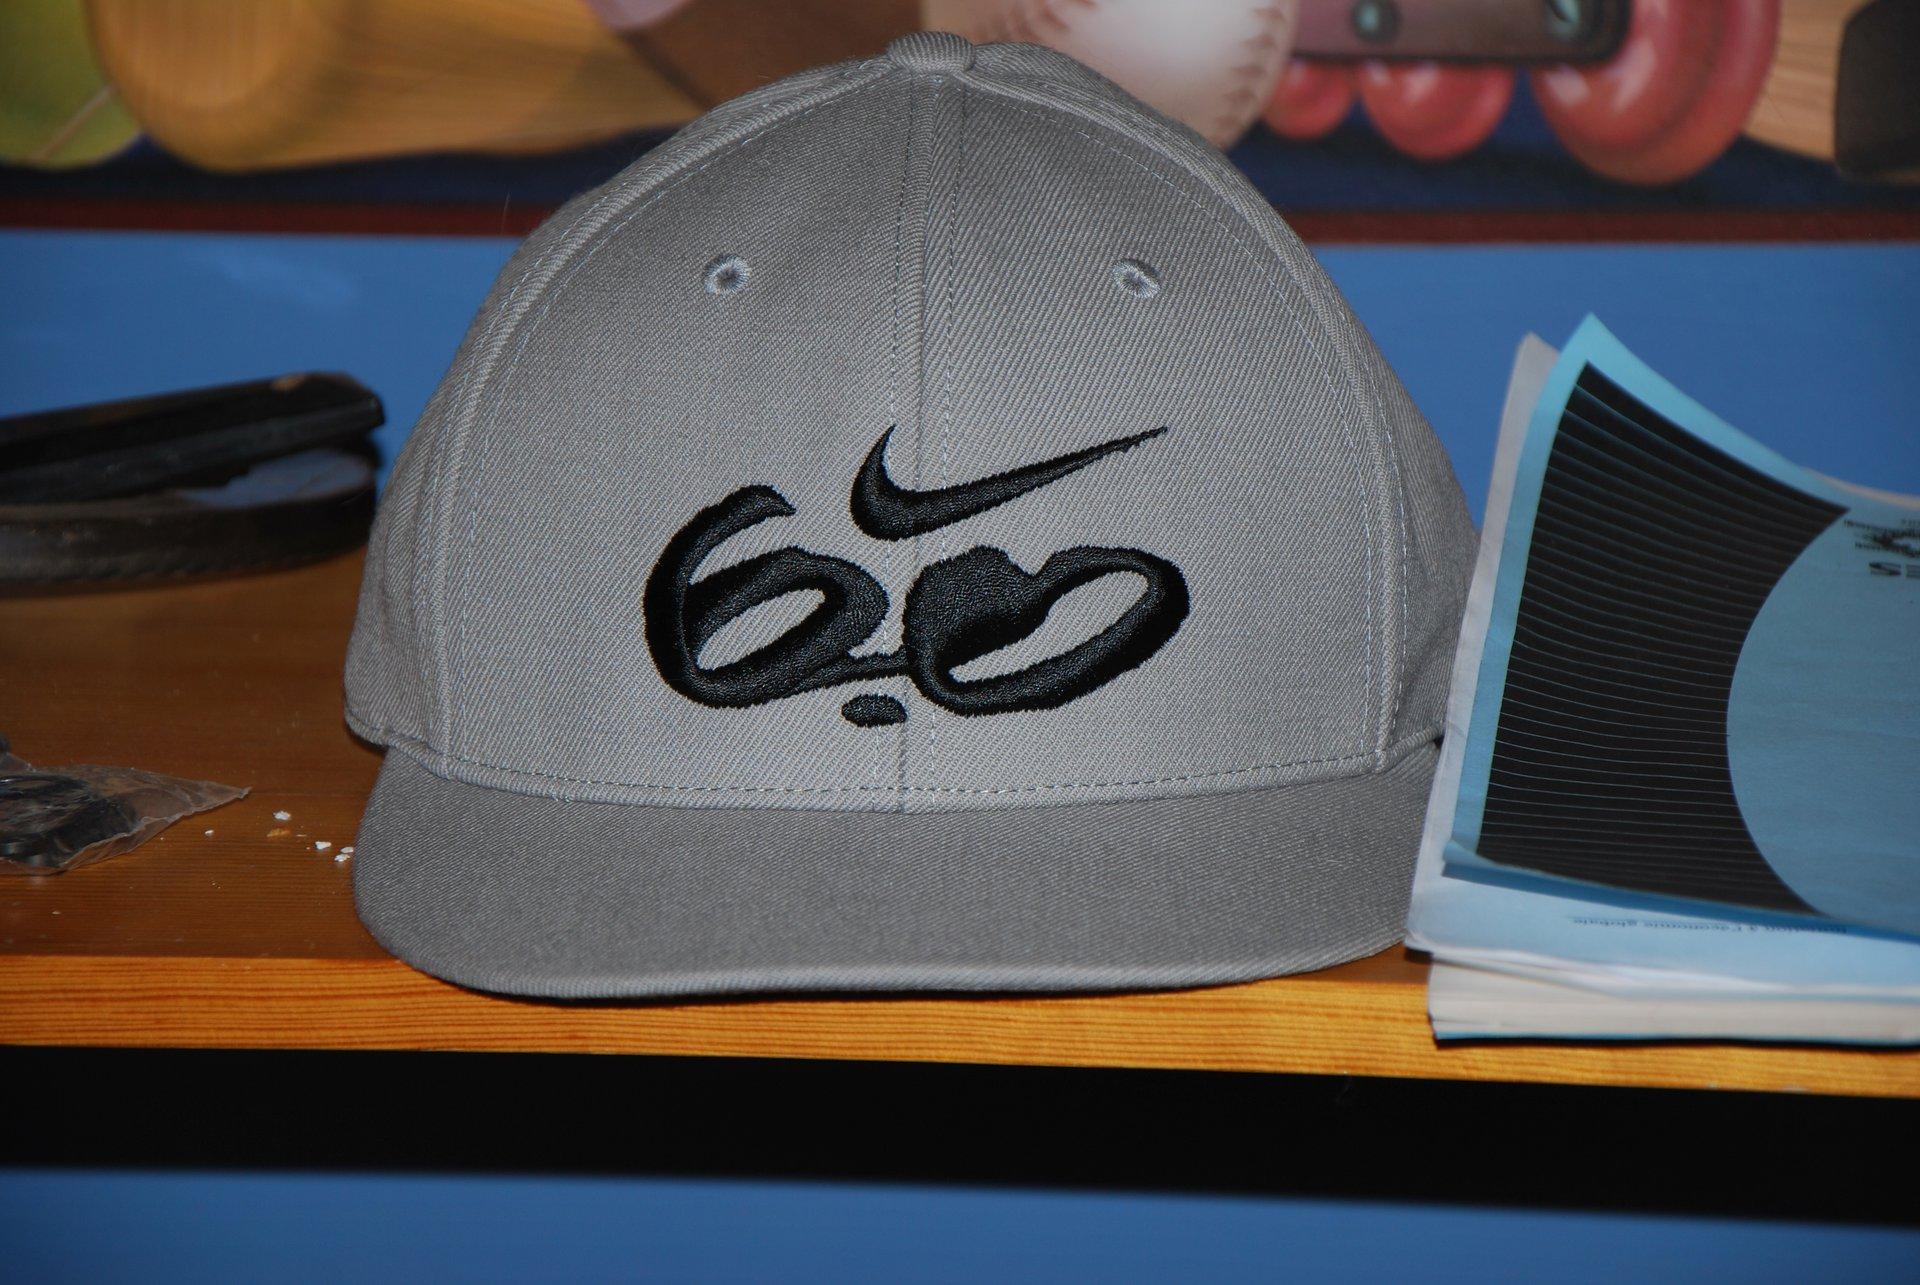 Nike 6.o cap